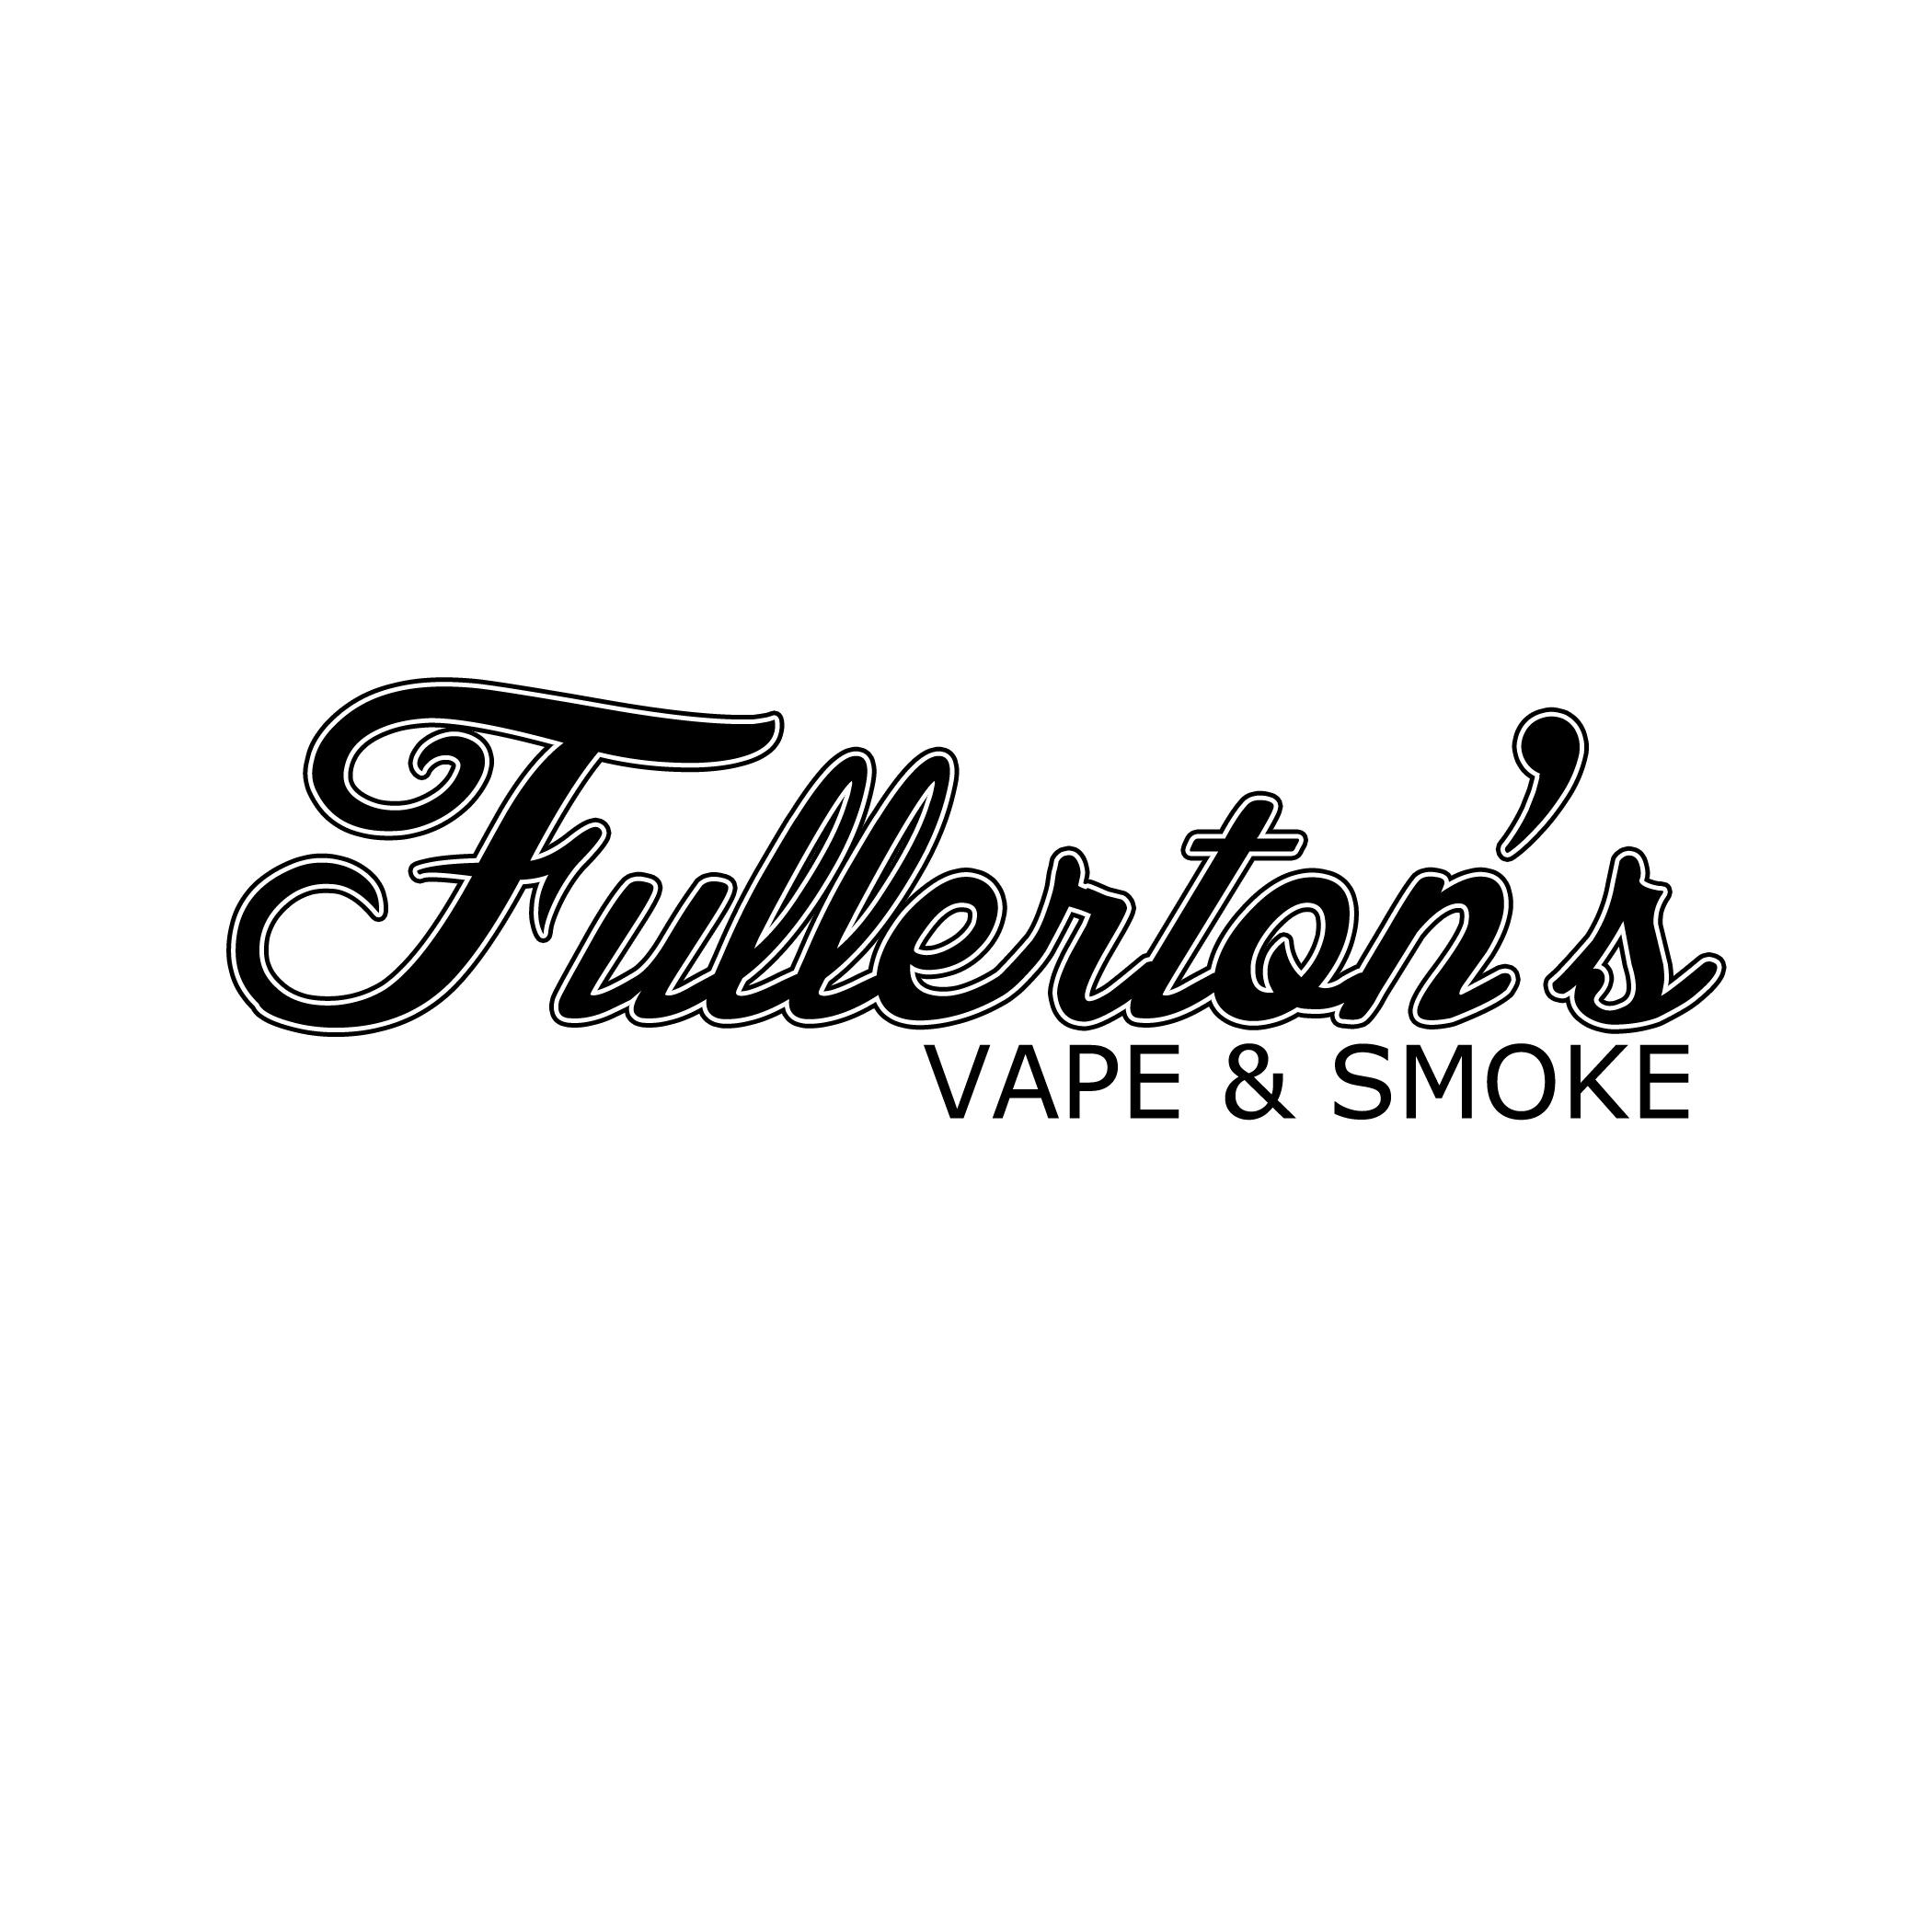 Fullerton's Vape and Smoke